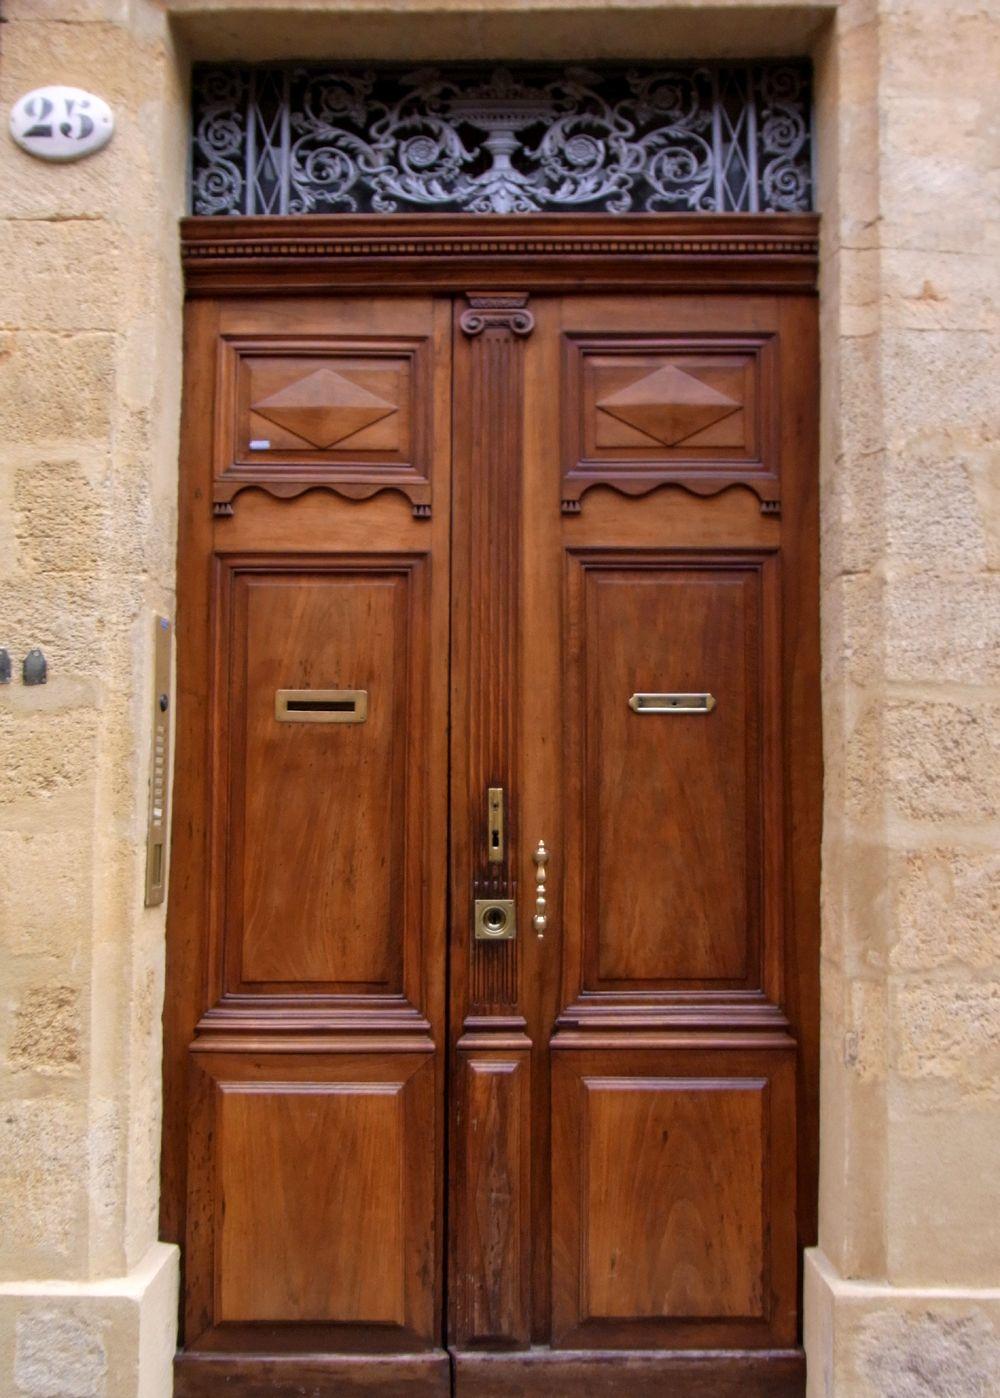 Franz sische vintage haust r holz t ren doors - Pinterest holz ...